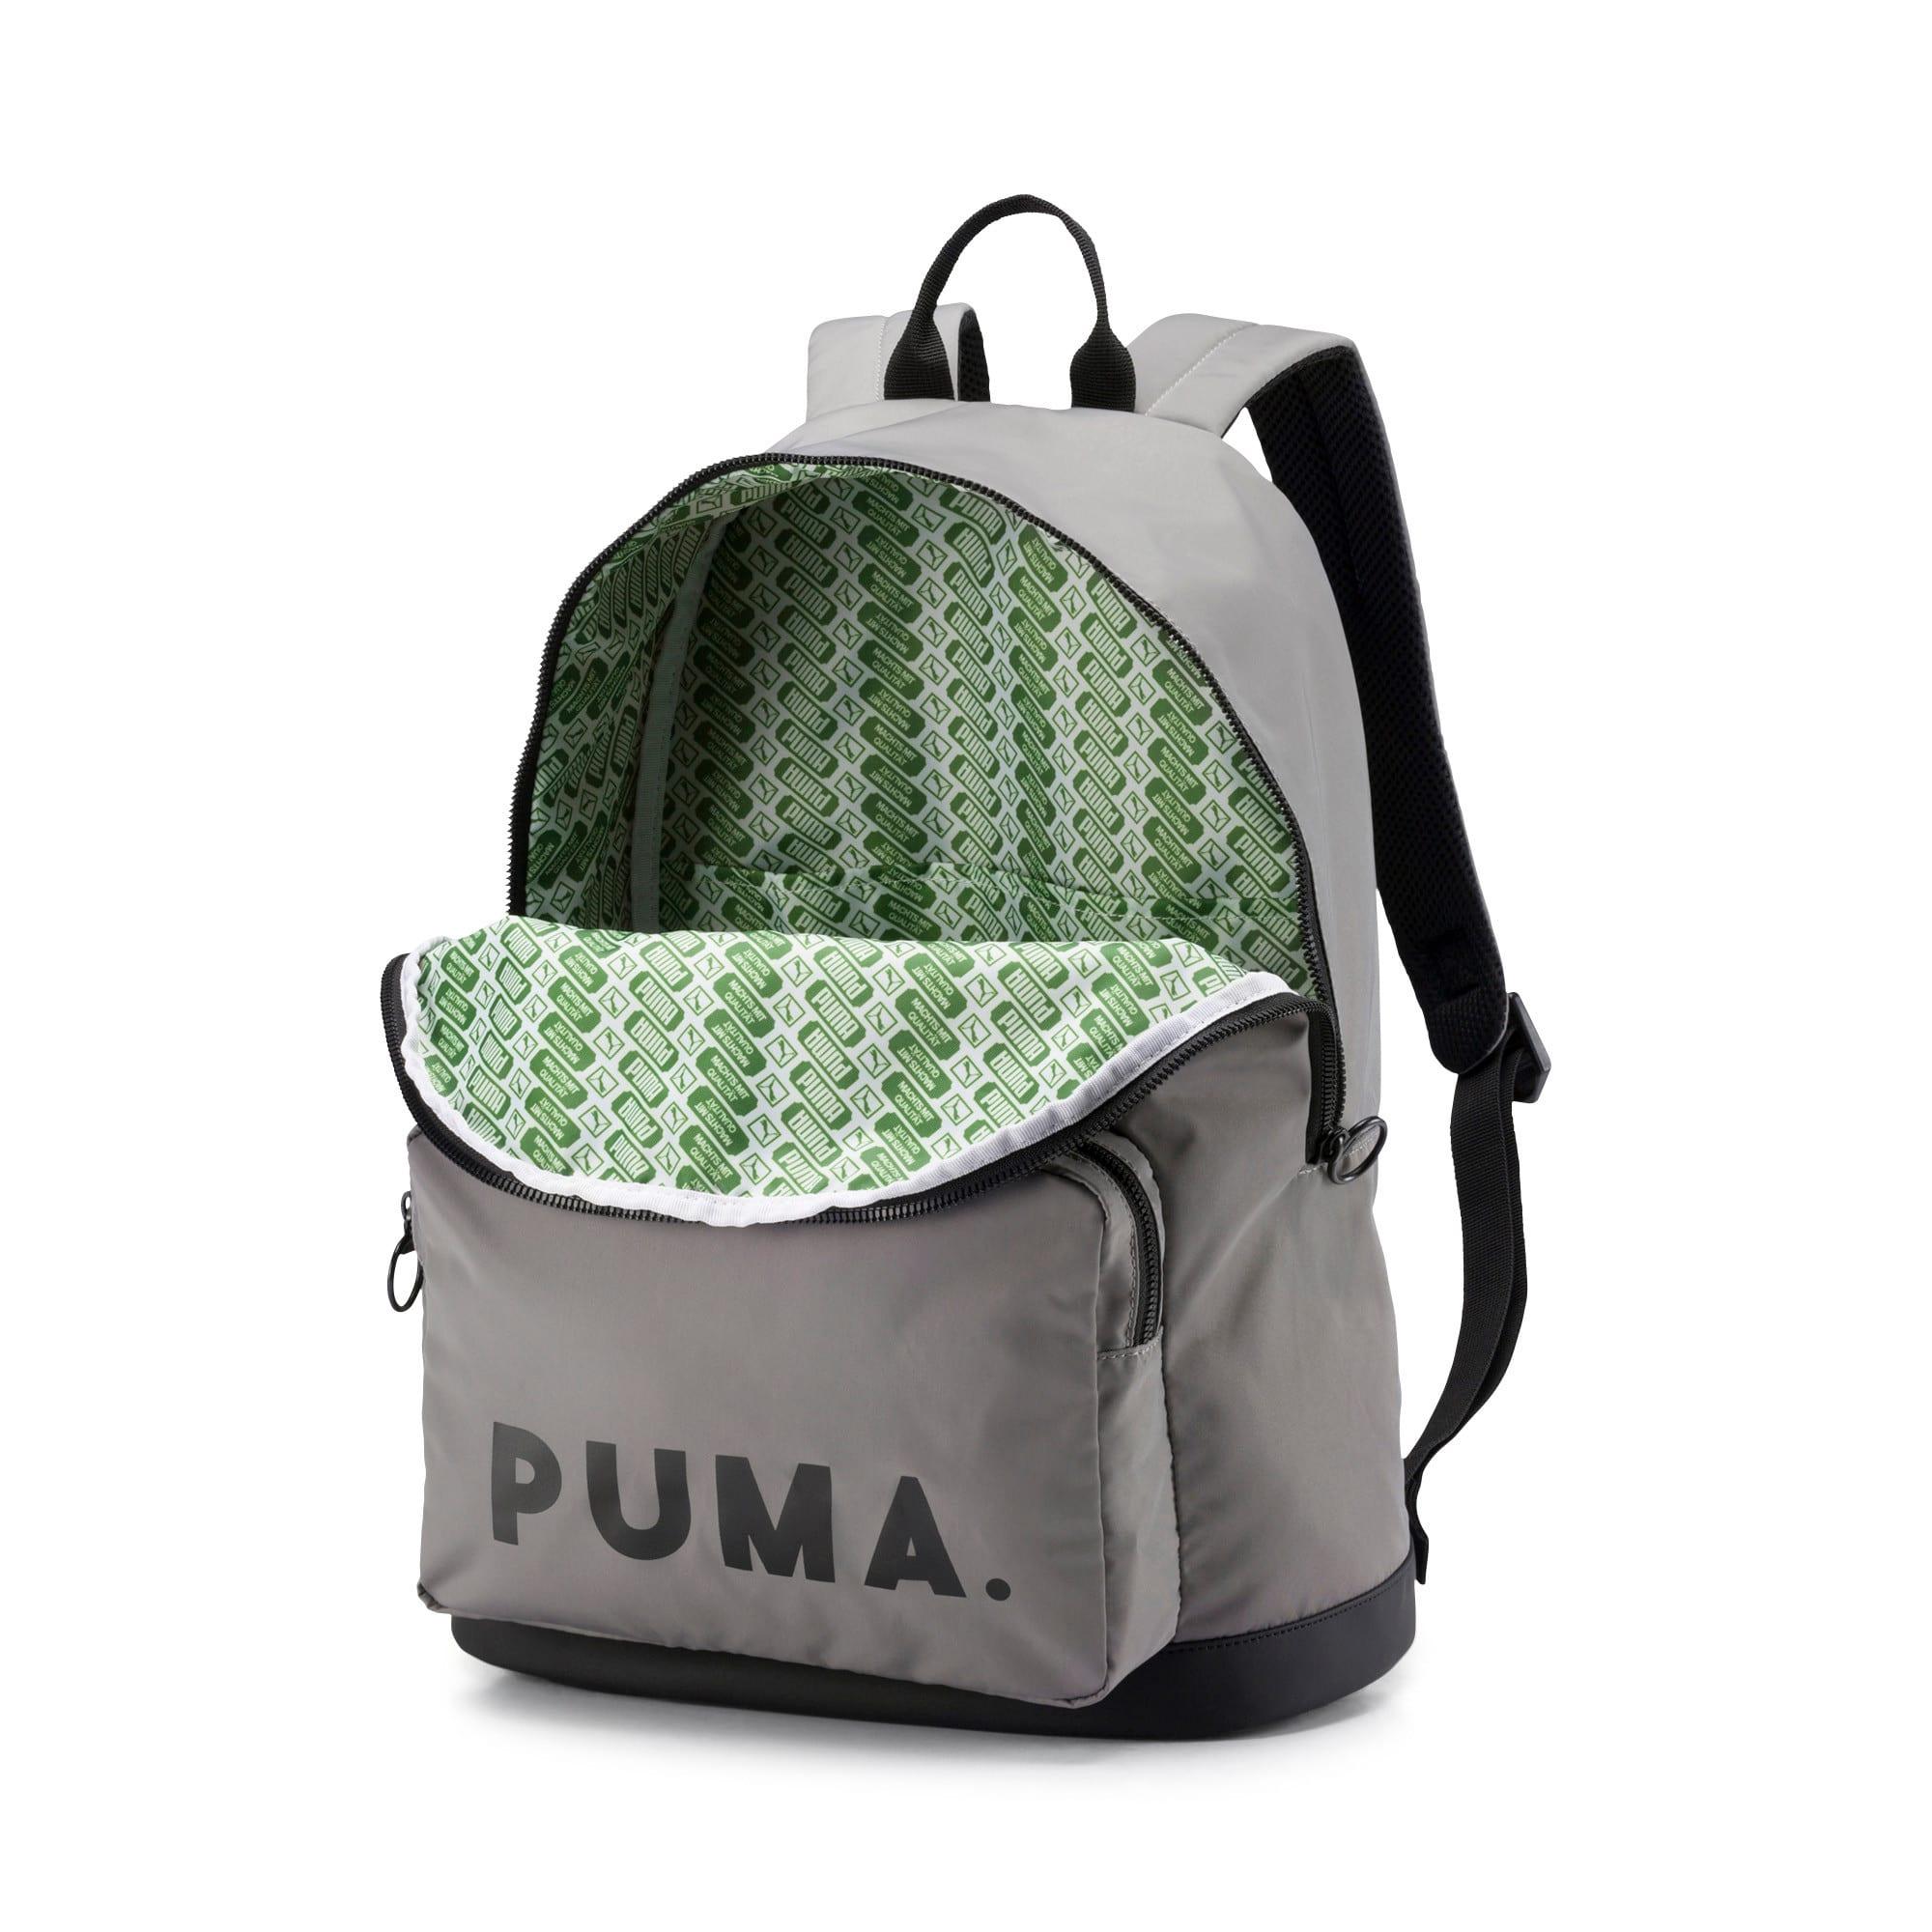 Thumbnail 3 of Originals Backpack Trend, Steel Gray-Puma Black, medium